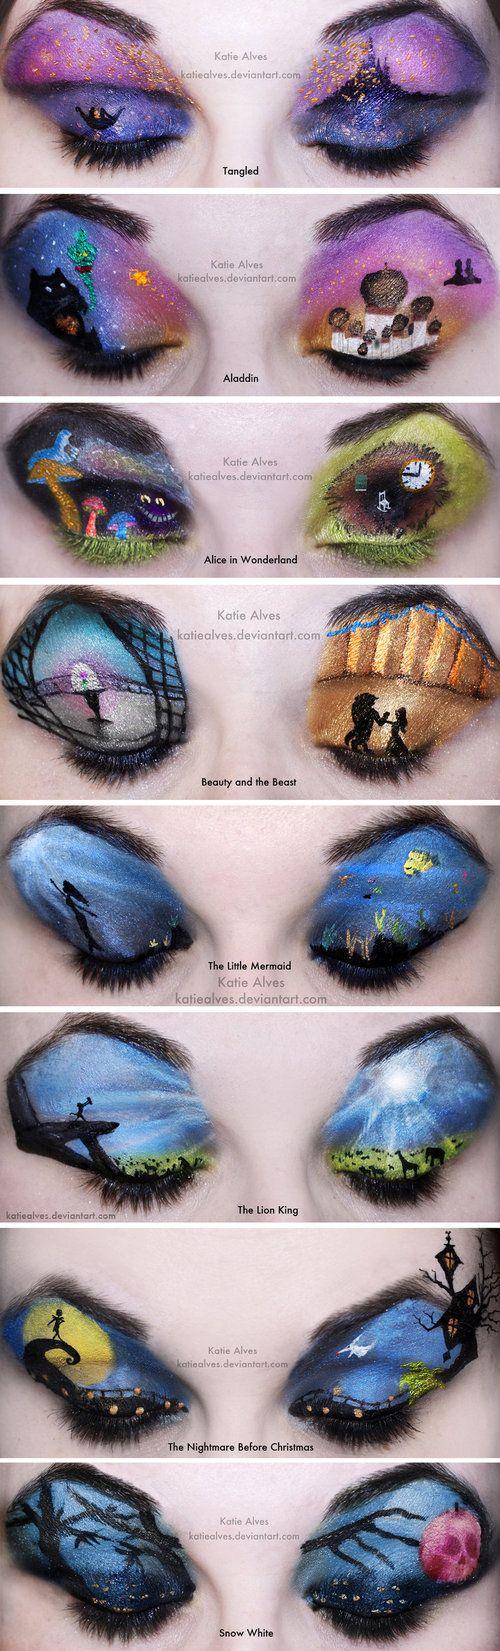 Disney stories through eyeshadow - very decorative eyelids! SO AWESOME!